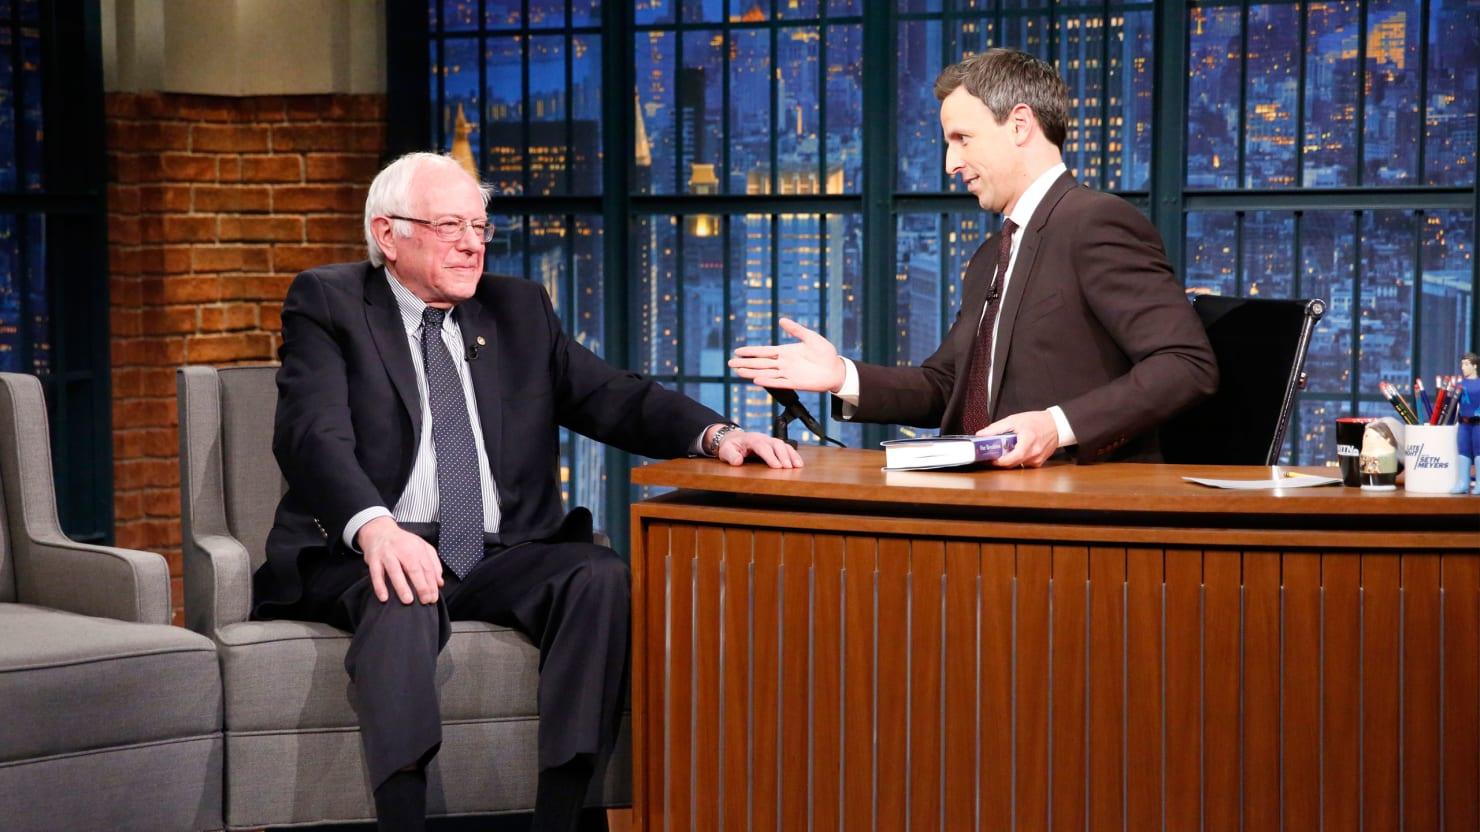 Bernie Sanders Blasts Trump's Cabinet of 'Billionaires and Millionaires'